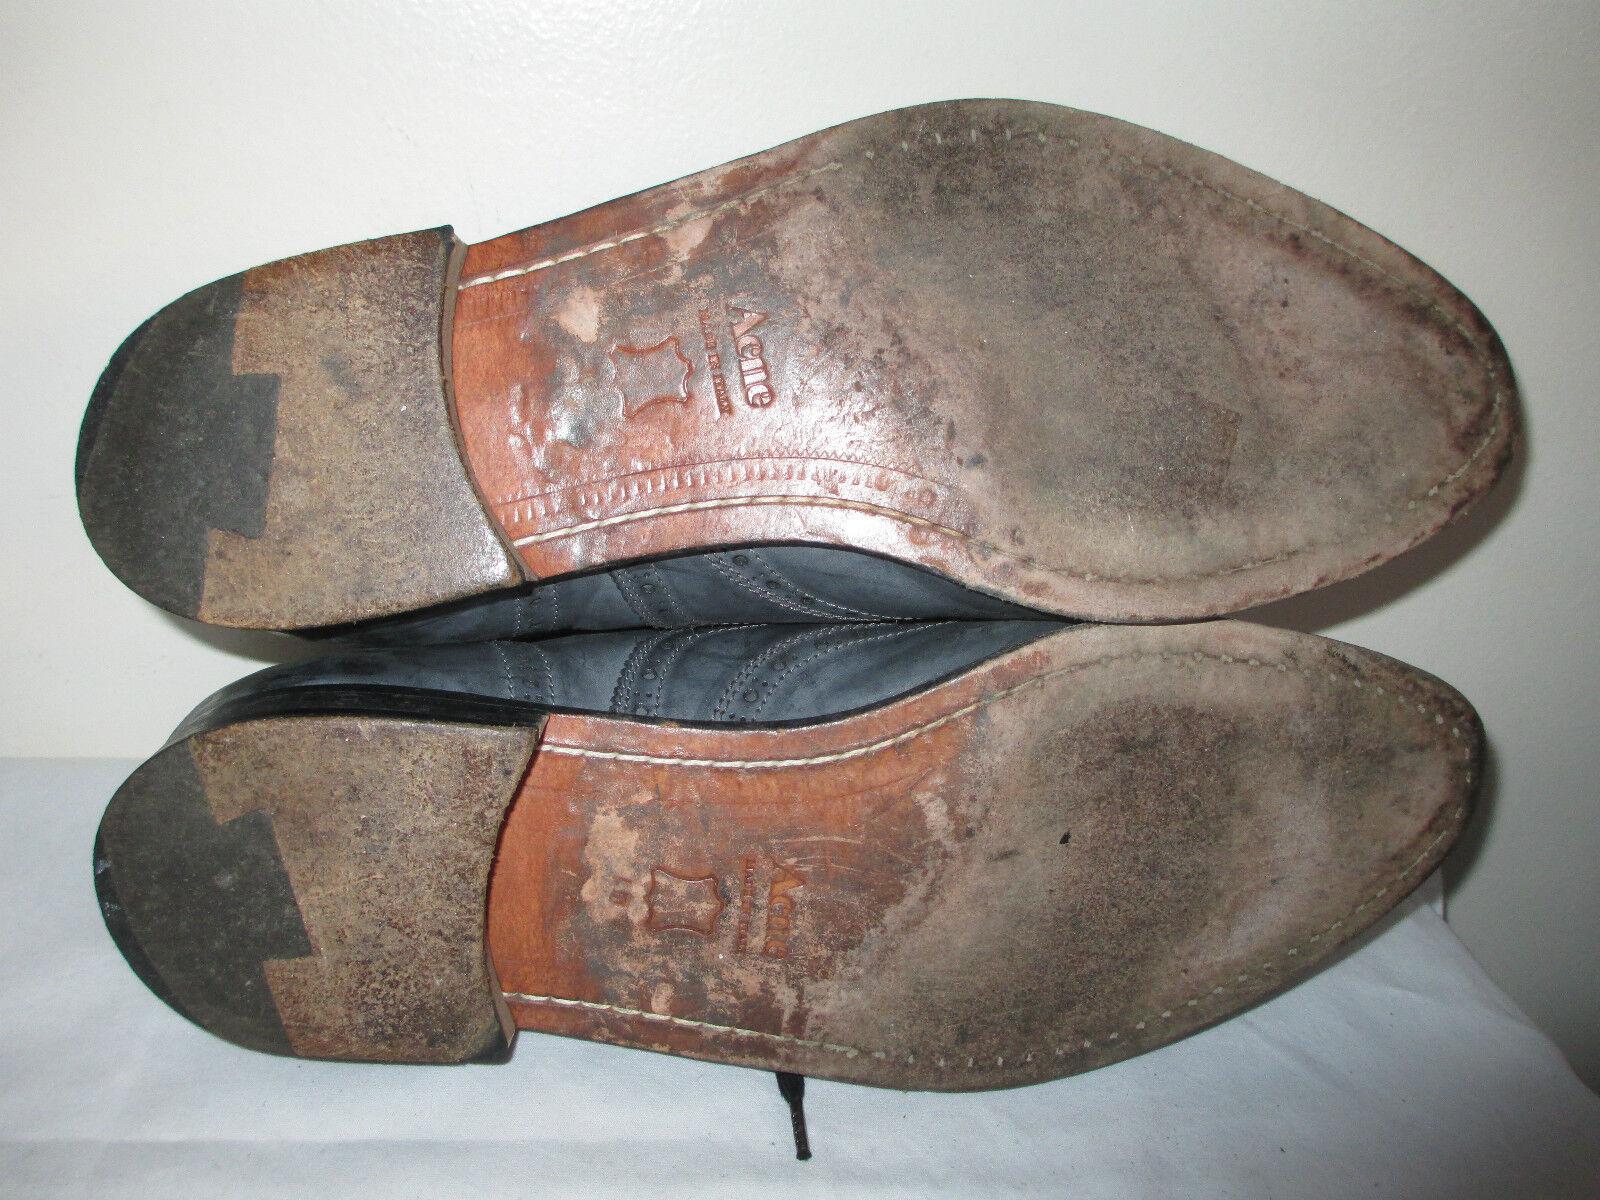 ACNE uomo's Navy Blue Lace RARE! up Wing Tips Leather Shoes Italy Sz 12.5 RARE! Lace Scarpe classiche da uomo a59864